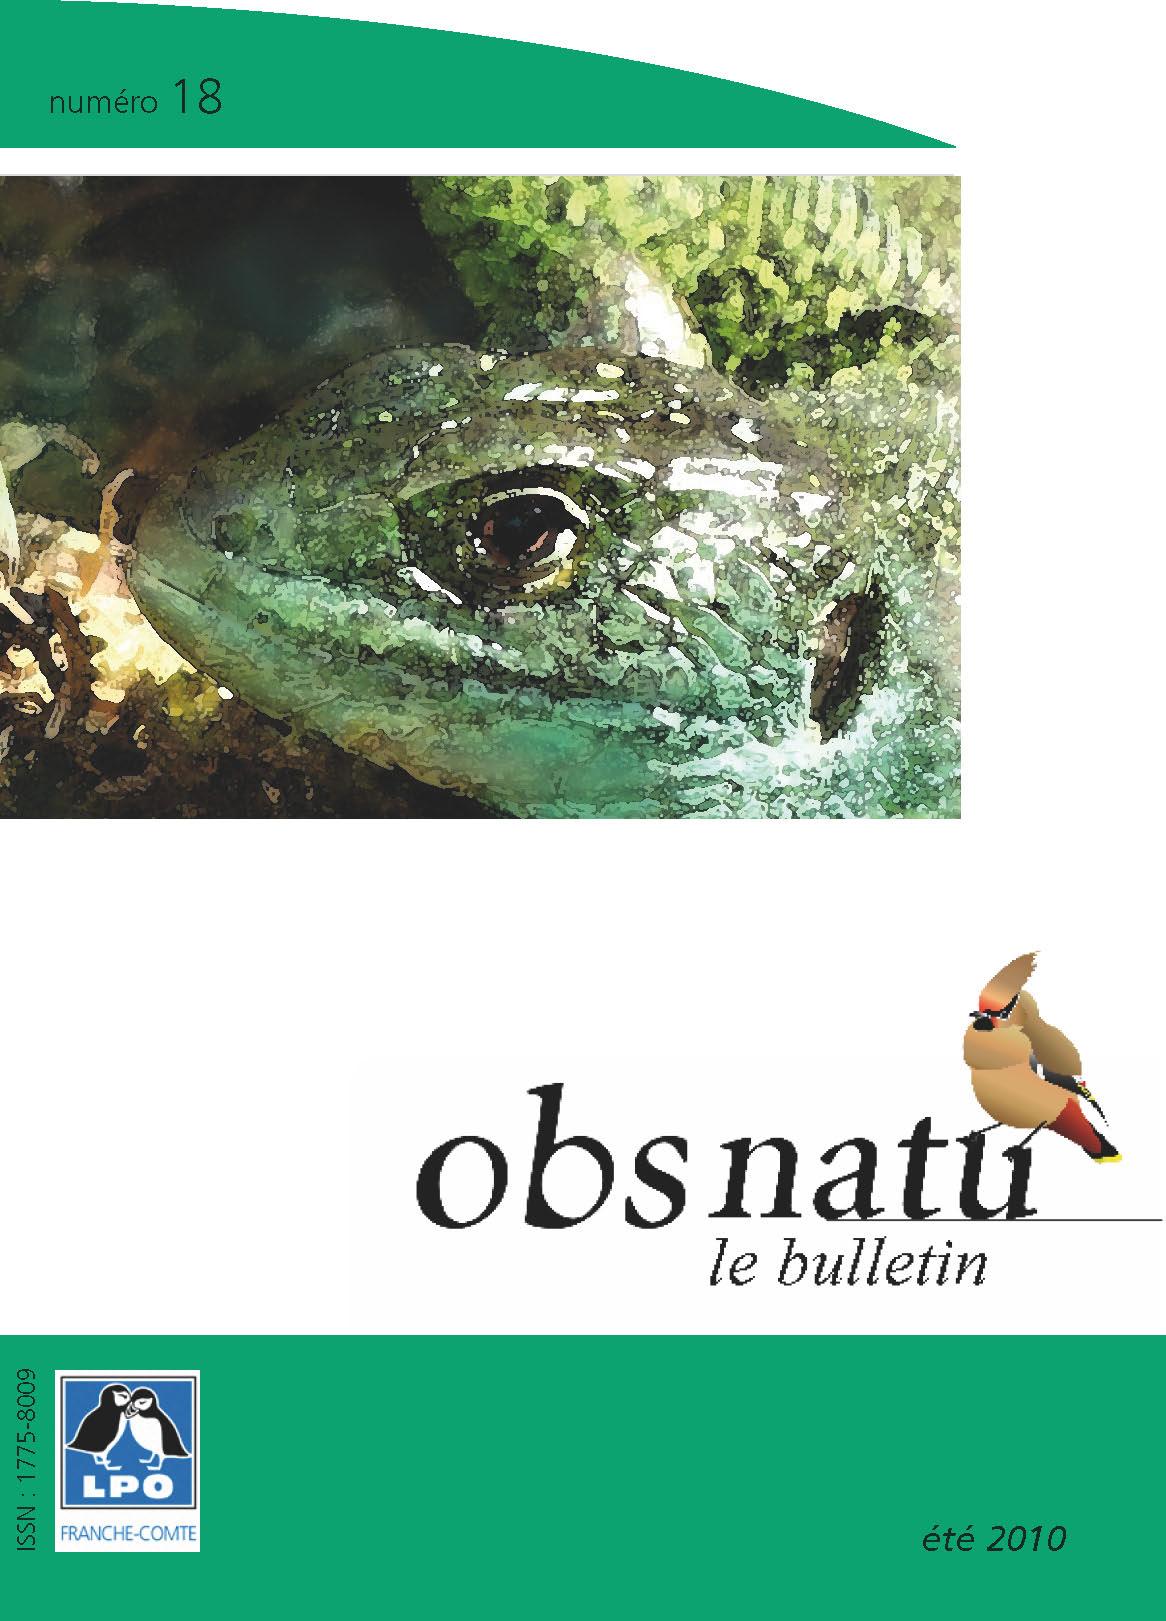 https://cdnfiles1.biolovision.net/franche-comte.lpo.fr/userfiles/publications/Obsnatubulls/Obsnatu18-Ete2010bdPage01.jpg